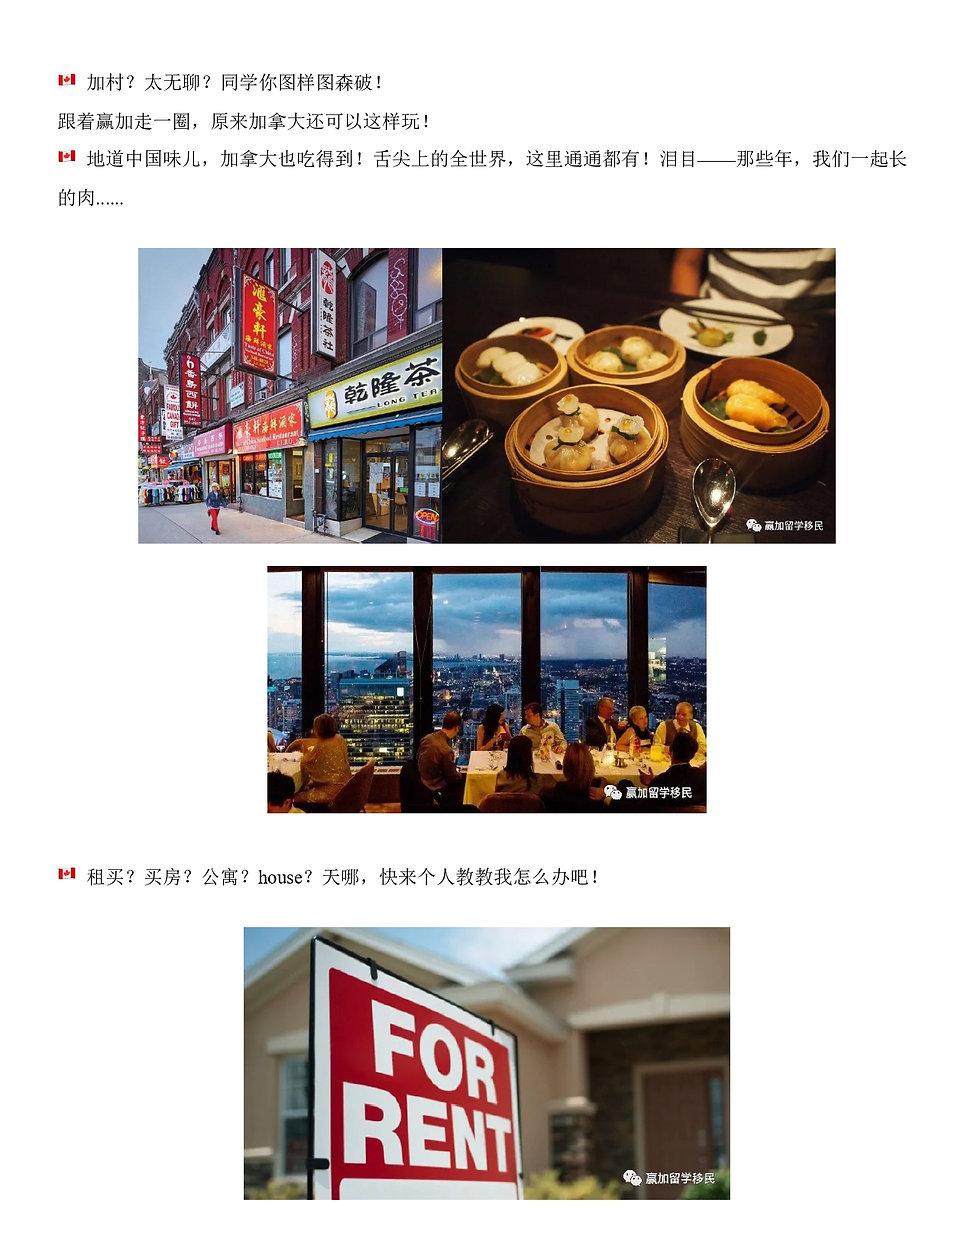 生活_page-0002.jpg